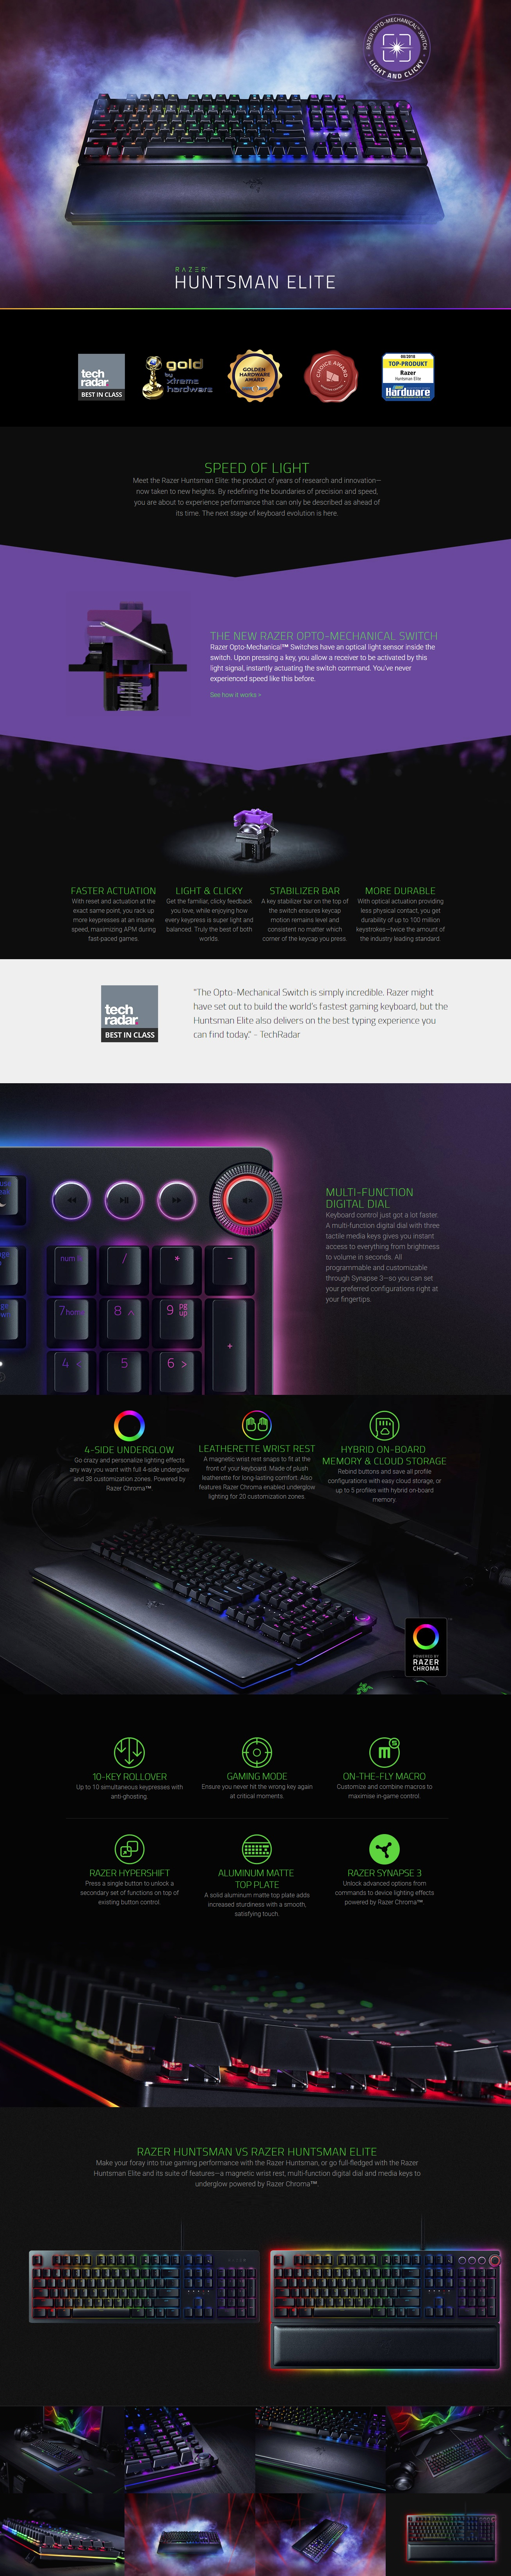 Razer Huntsman Elite OPTO Mech Gaming Keyboard - RZ03-01870100-R3M1 (2Y) -  GamePro Shop